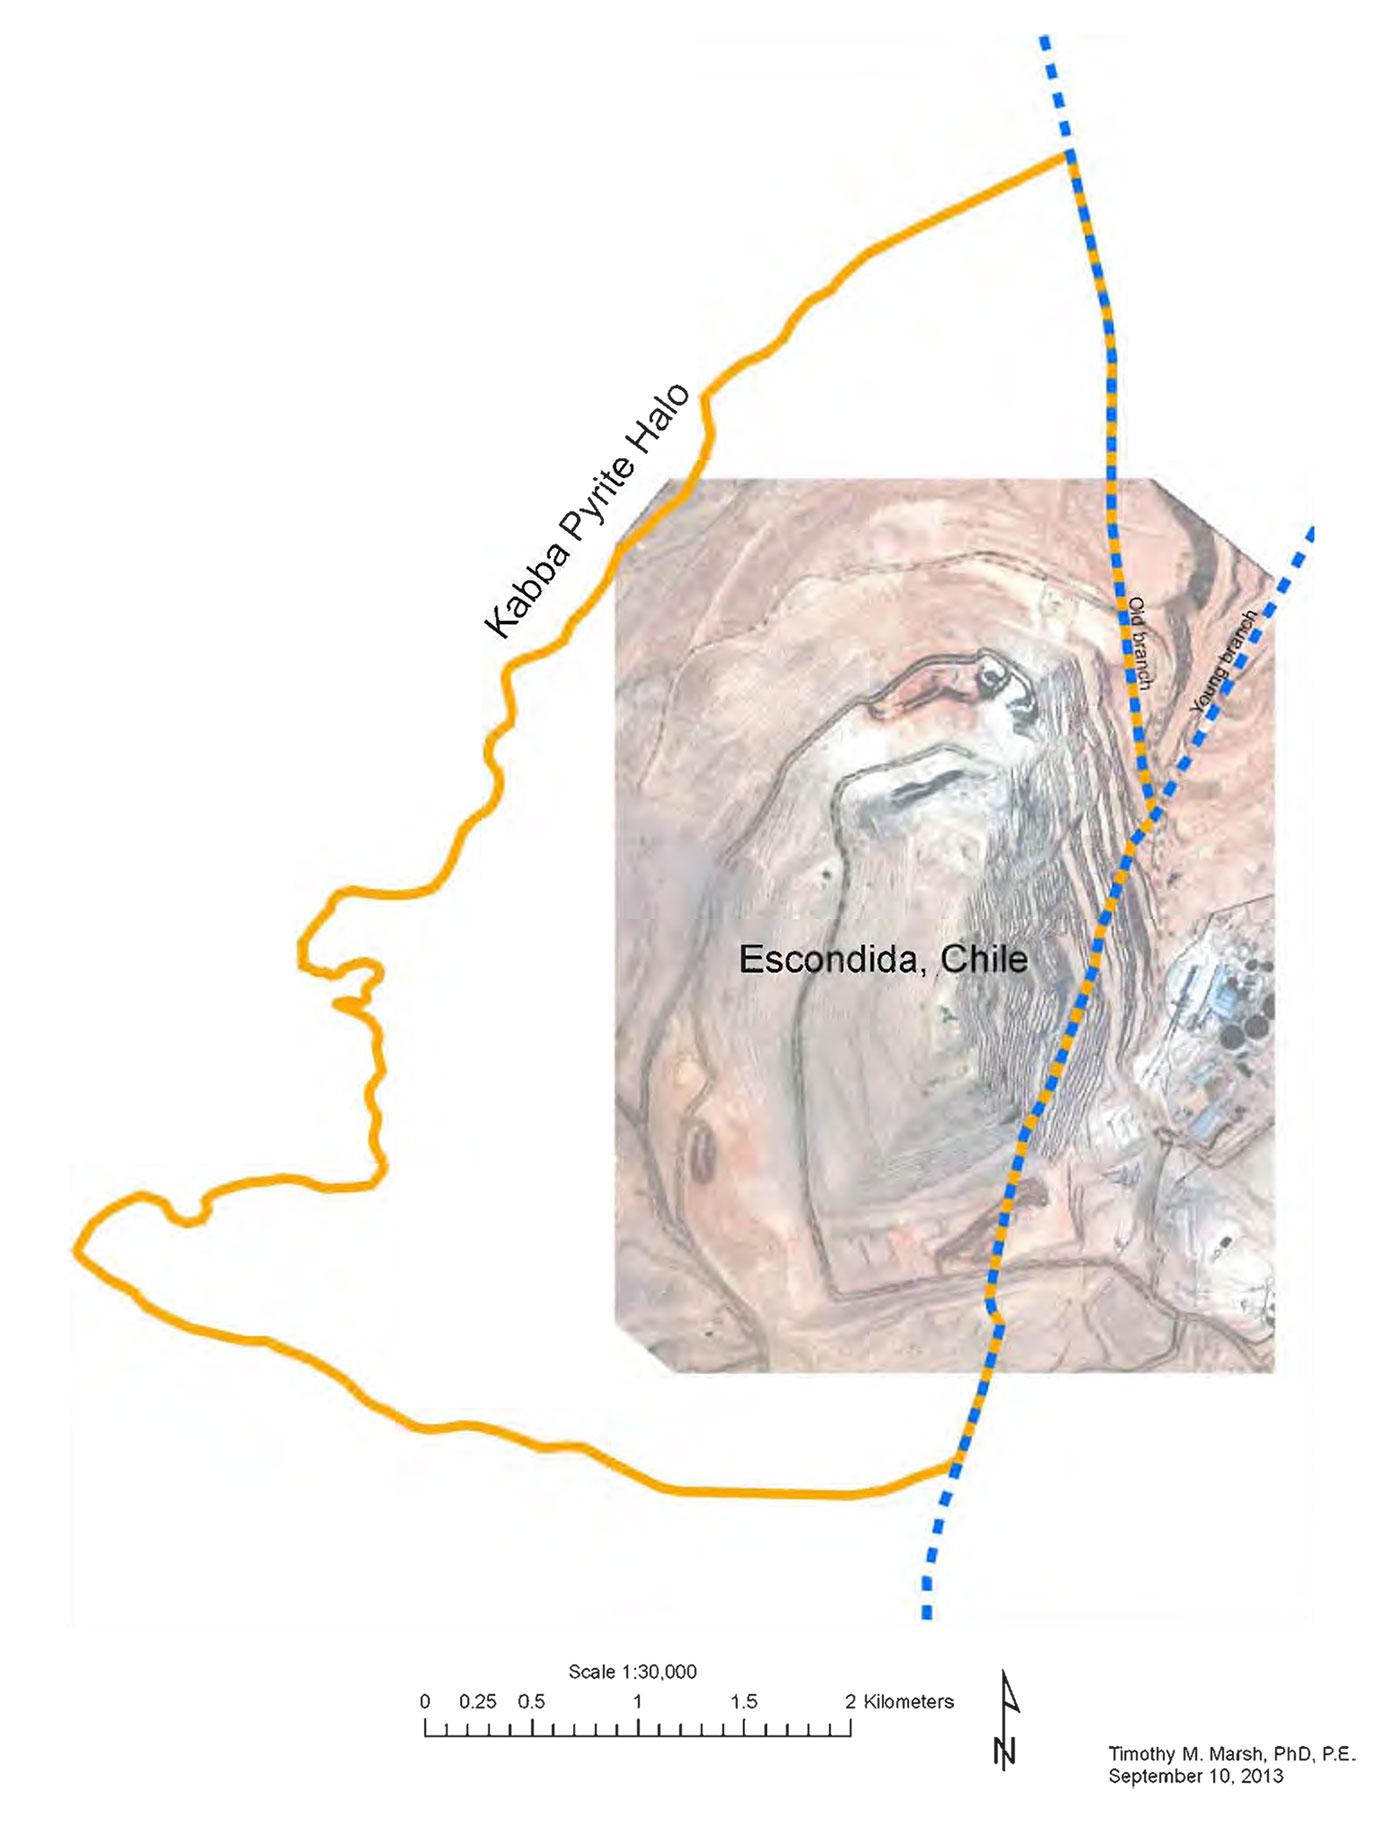 Kabba vs. Escondida (world's largest copper mine)